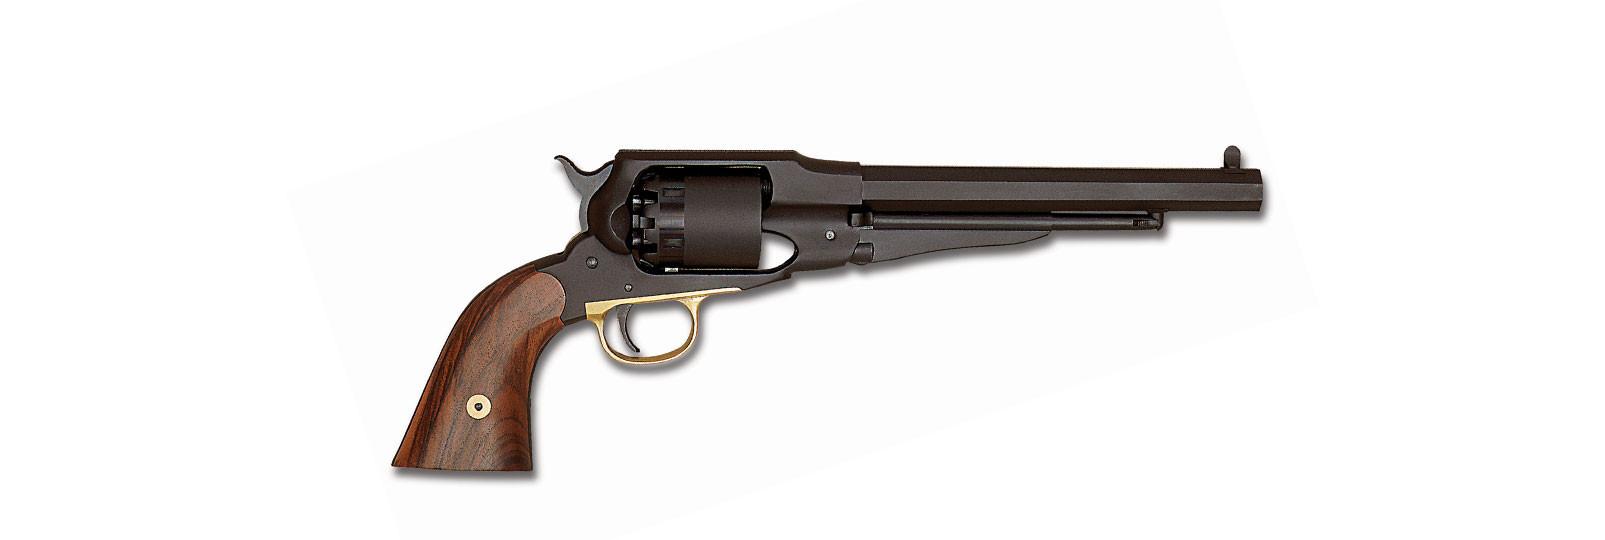 Remington pattern revolver .44